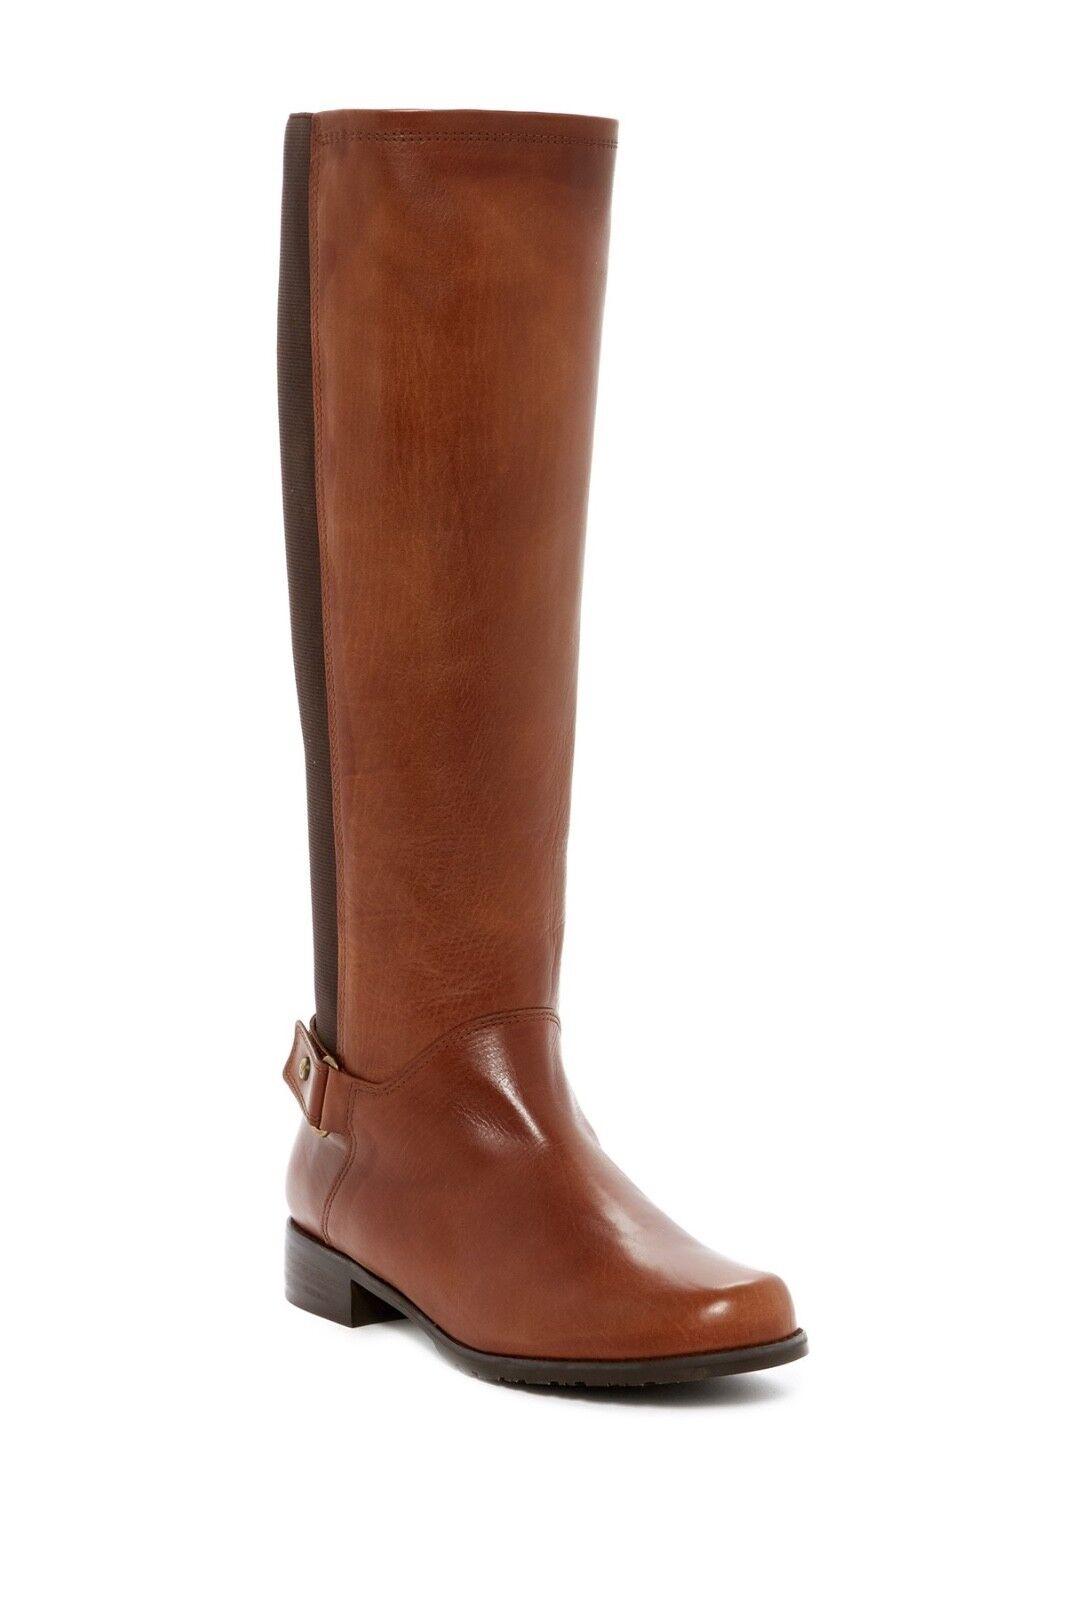 Size 5.5 Stuart Weitzman Mount Stretch Knee High Brown Pelle Riding Boot  665